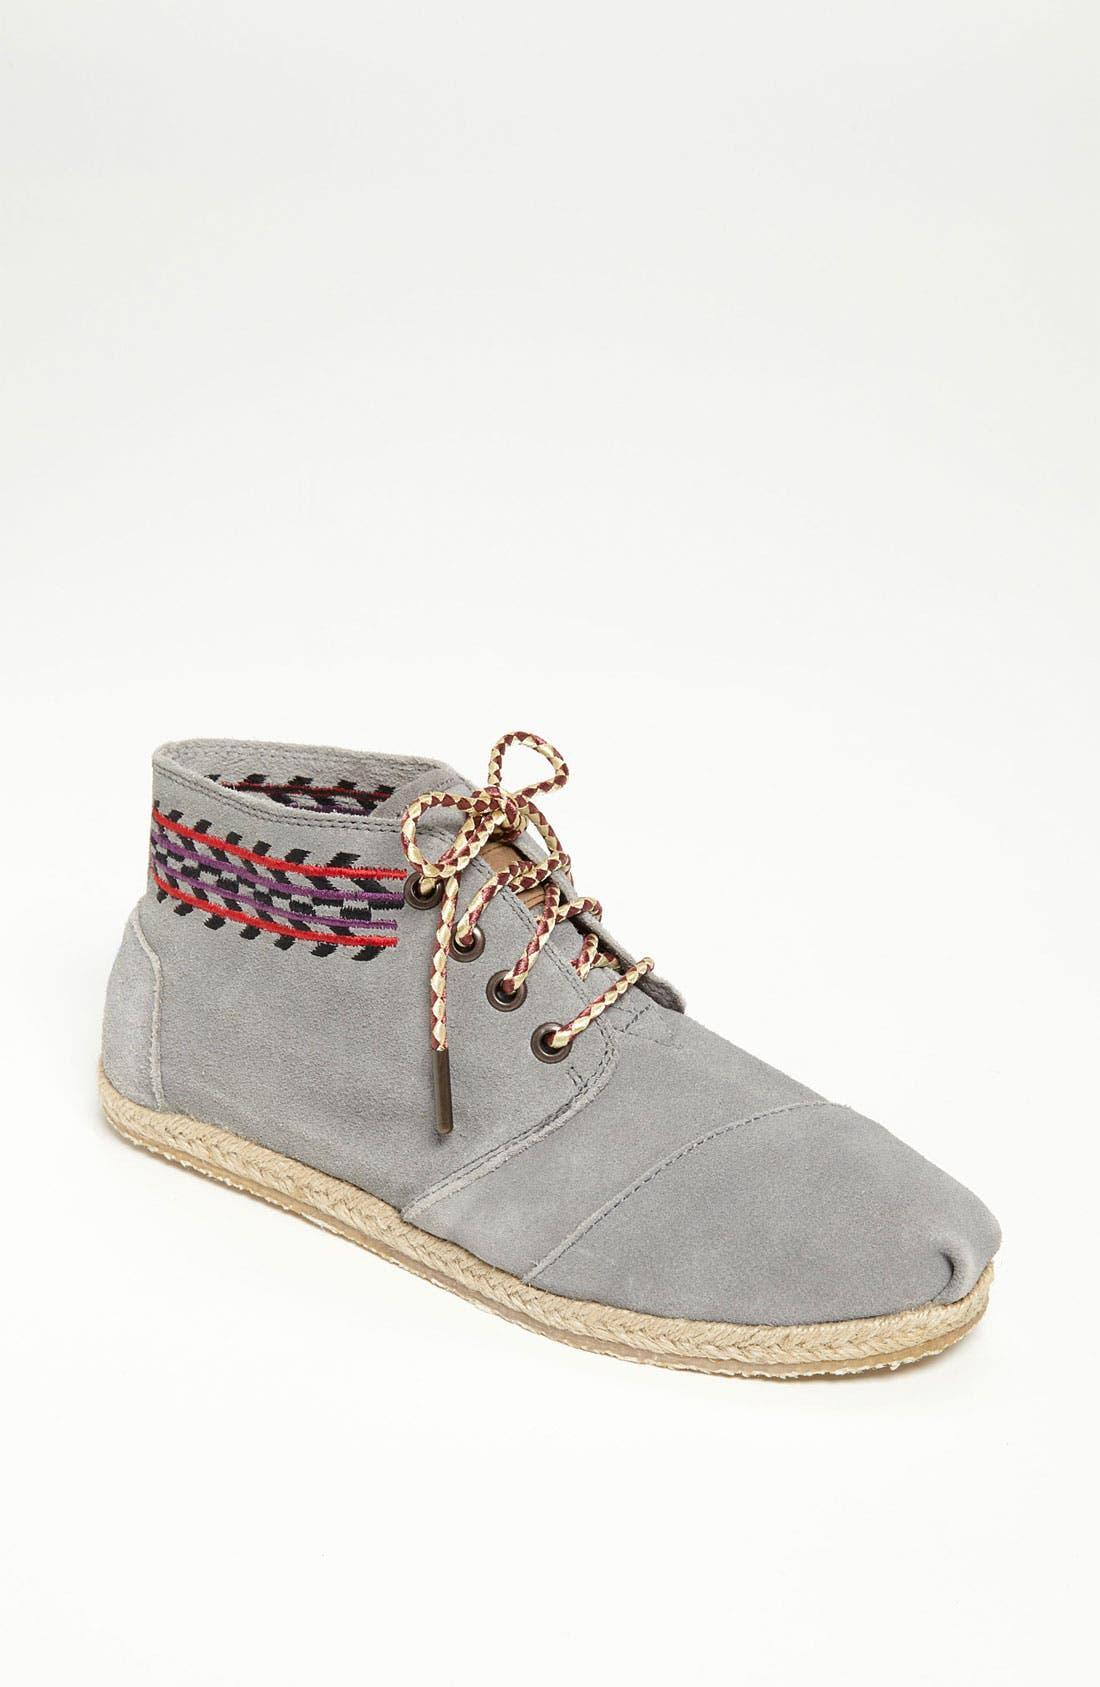 Main Image - TOMS 'Botas Desert - Alarco' Chukka Boot (Women)